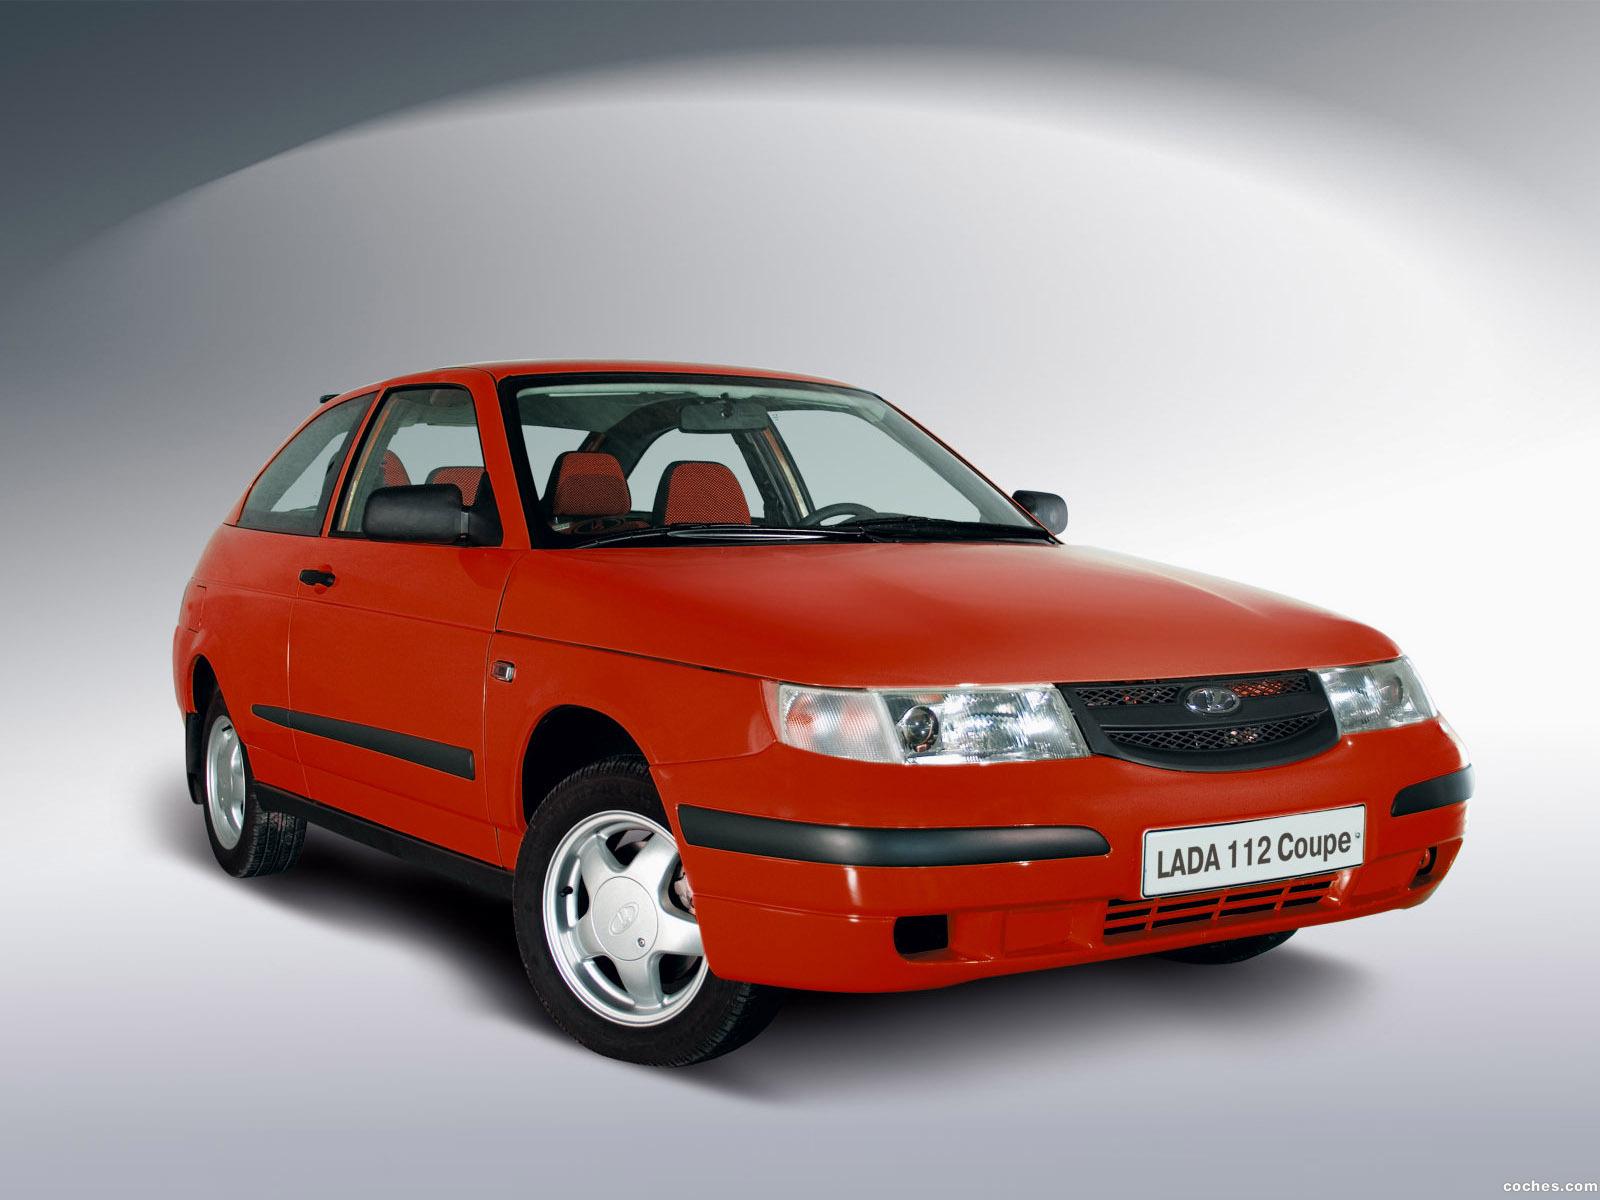 Foto 0 de Lada 112 Coupe 21123 2006